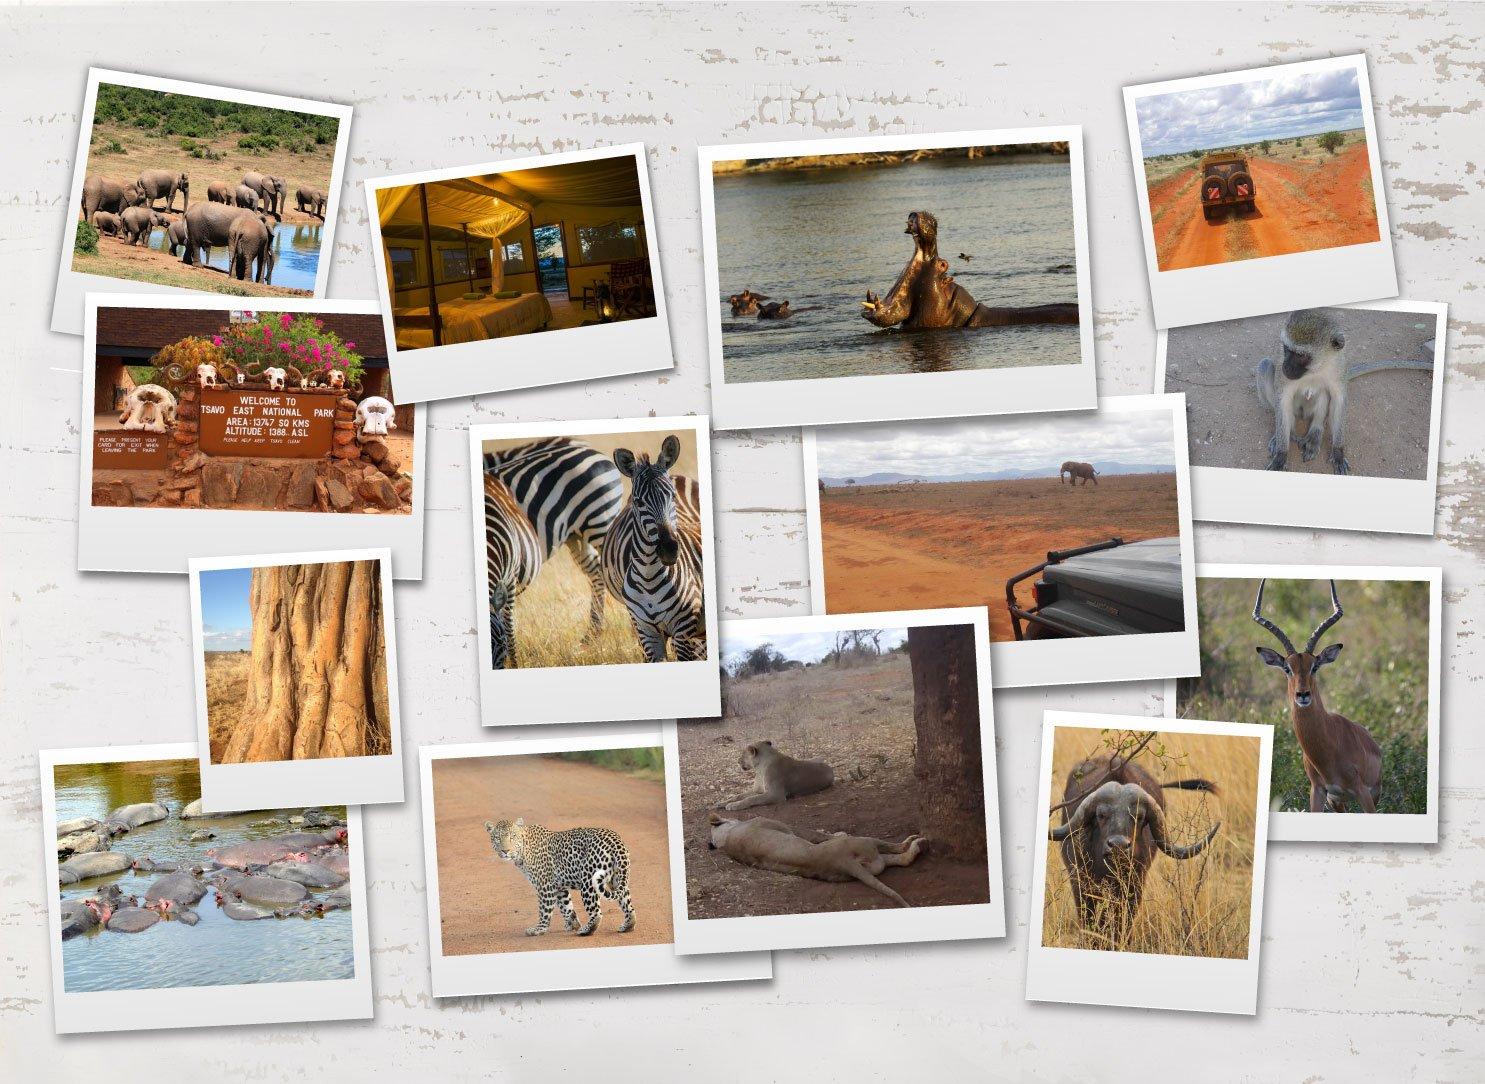 safari-fotografico-kenya-guida-parco-tsavo-est-east-animali-leone-savana-guida